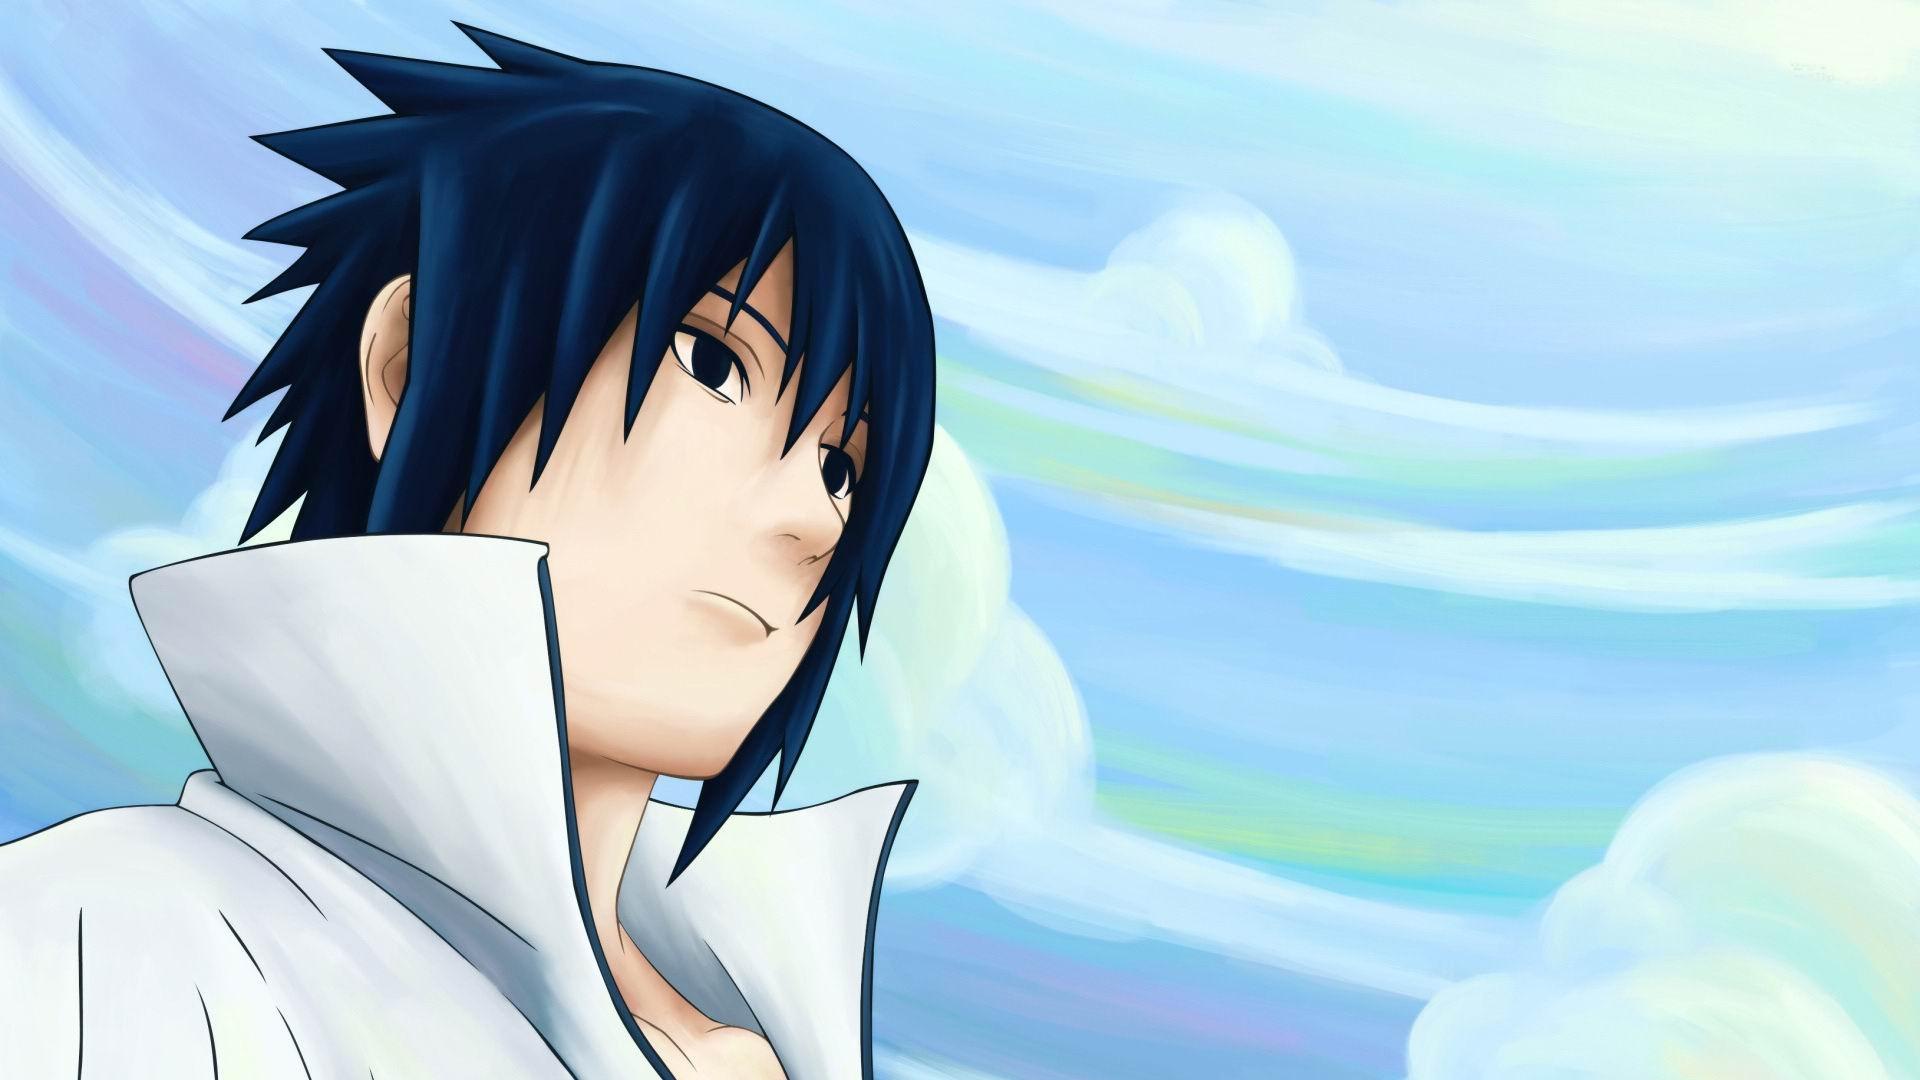 Sasuke Uchiha Personajes De Dibujos Animados Hd Fondo De